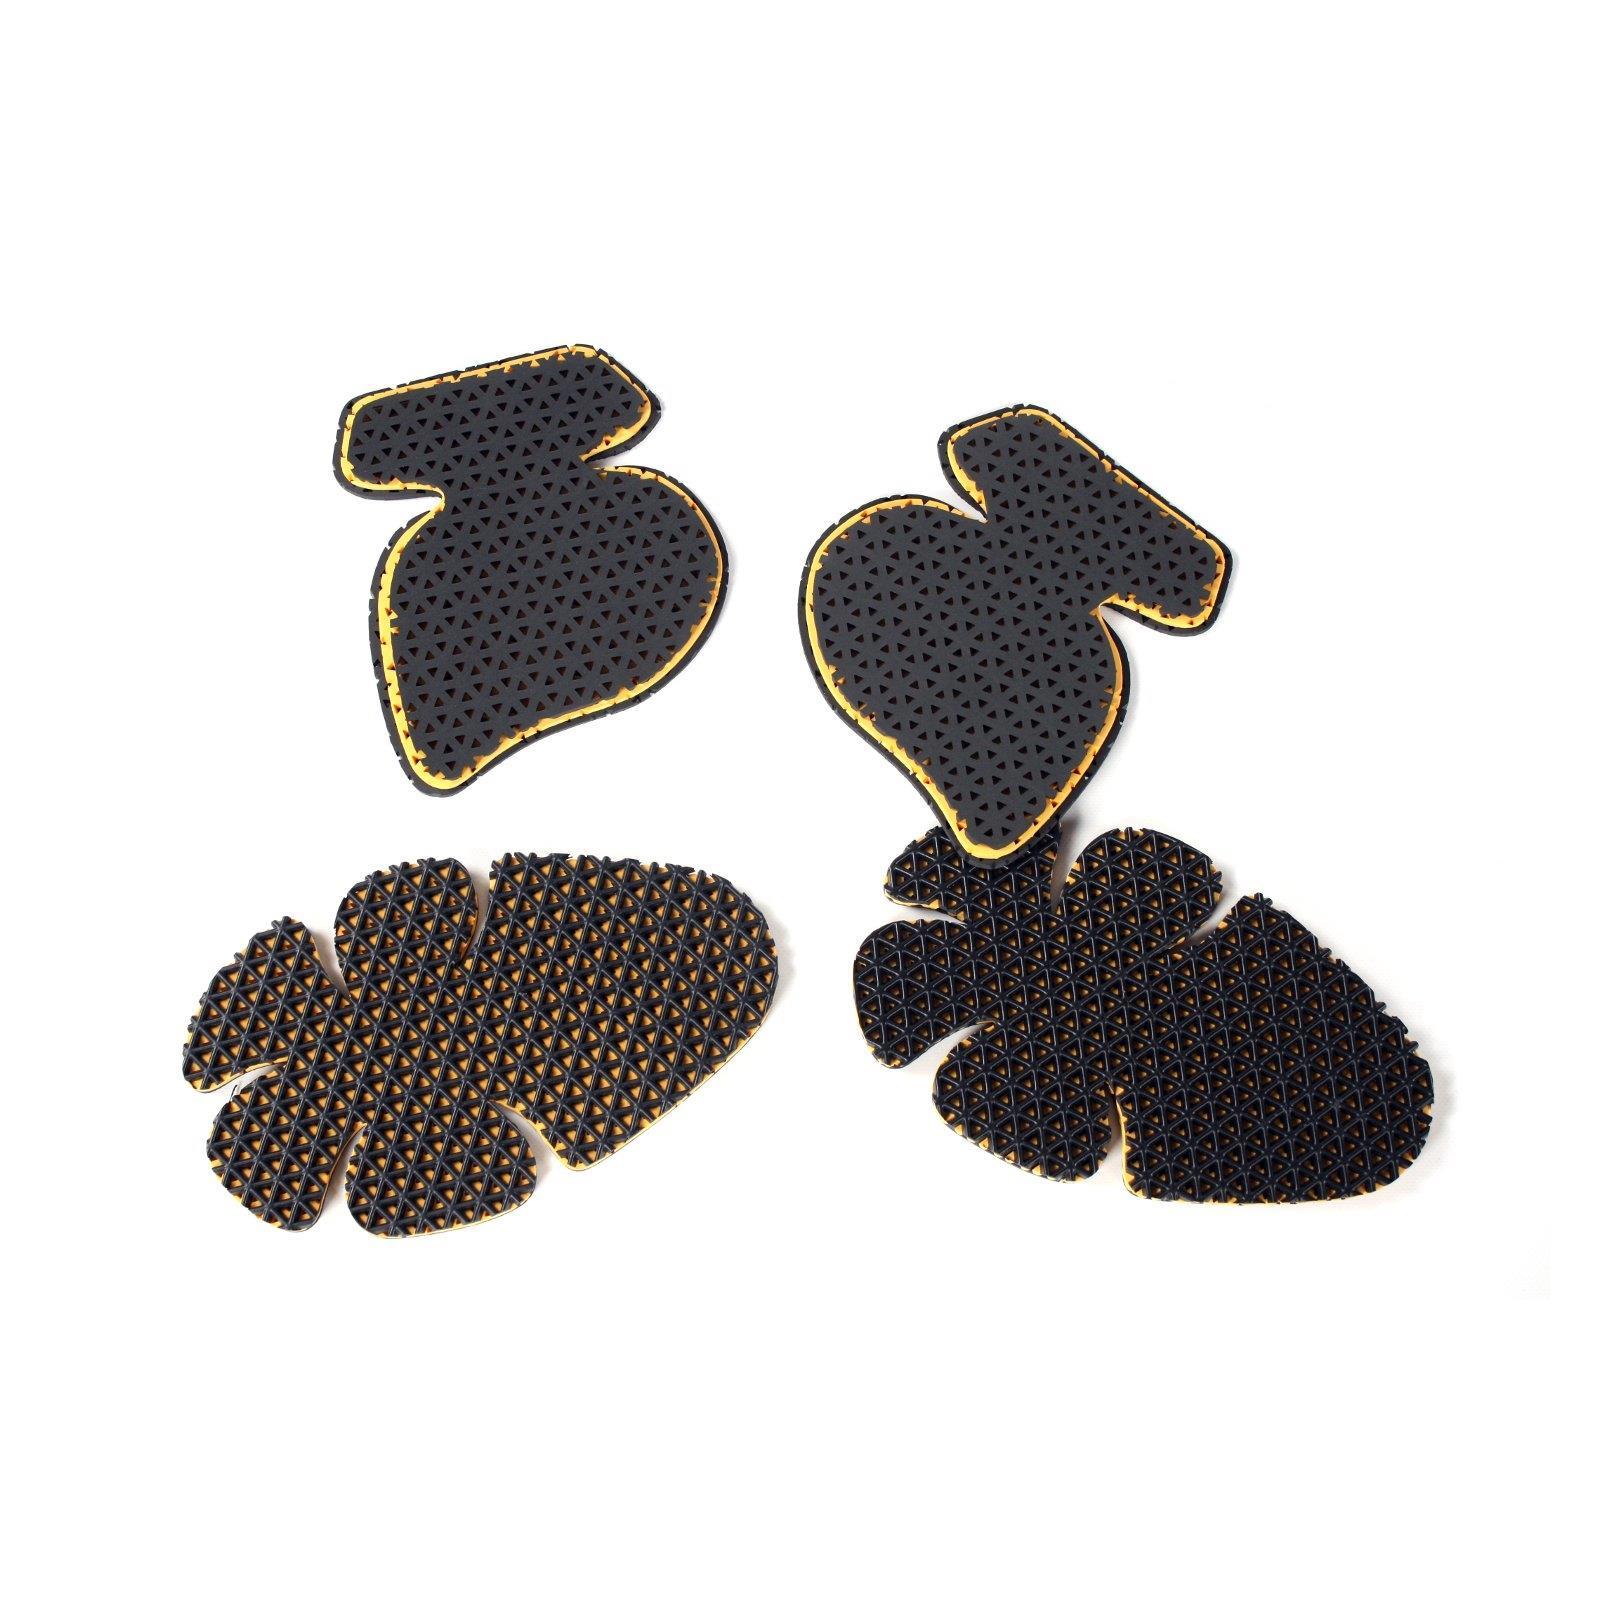 Trilobite-Pantaloni-Moto-Jeans-Abbigliamento-Parado-MICAS-URBAN-DUAL-PANTS-ACID miniatura 23